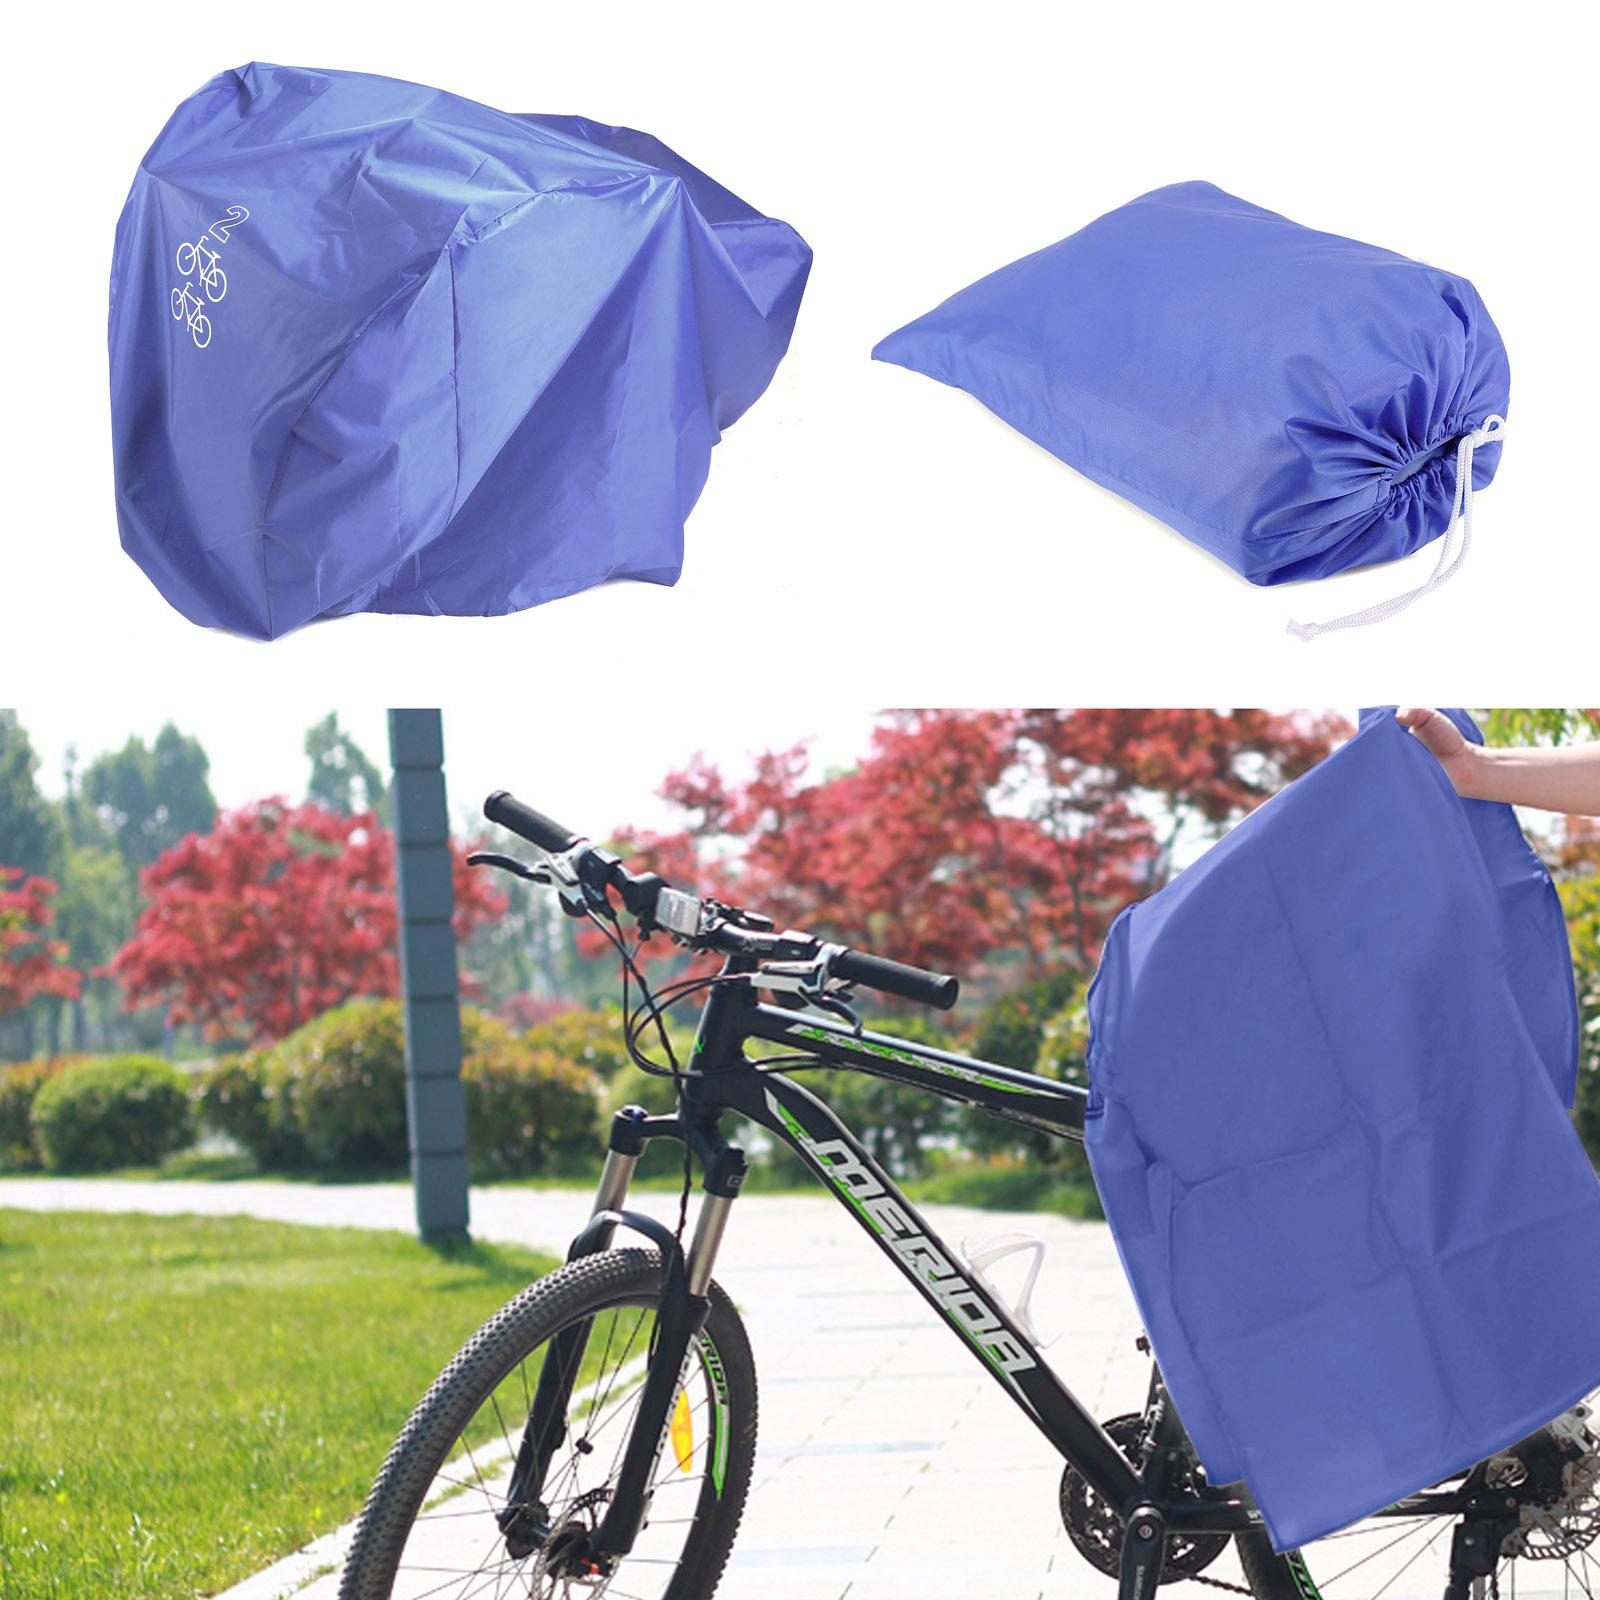 fahrradgarage abdeckung schutzhaube fahrradabdeckung f r 2 fahrr der ebay. Black Bedroom Furniture Sets. Home Design Ideas